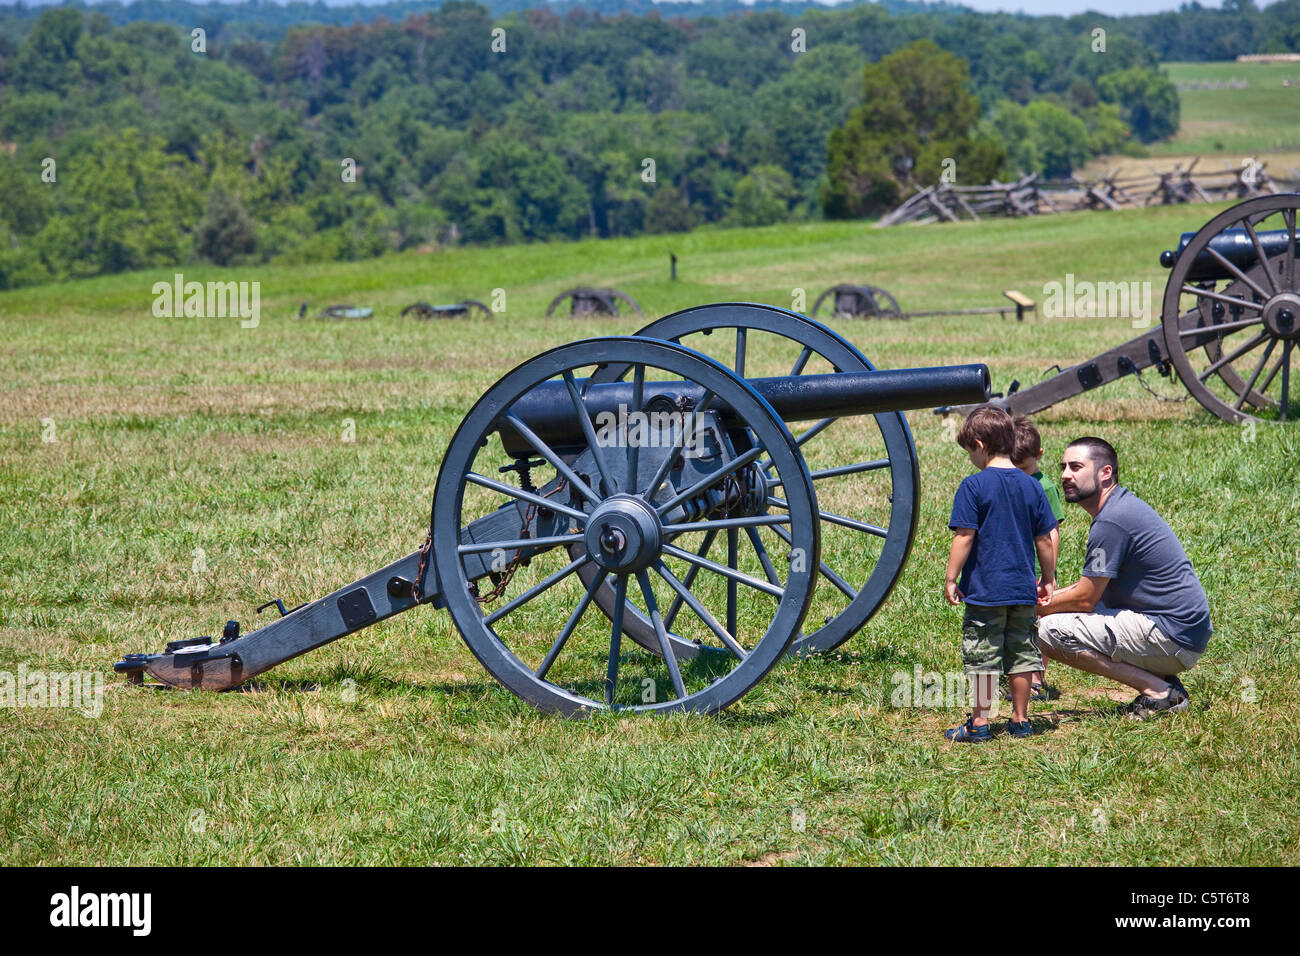 Manassas Junction or Bull Run Battleground Civil War site, Virignia, USA - Stock Image